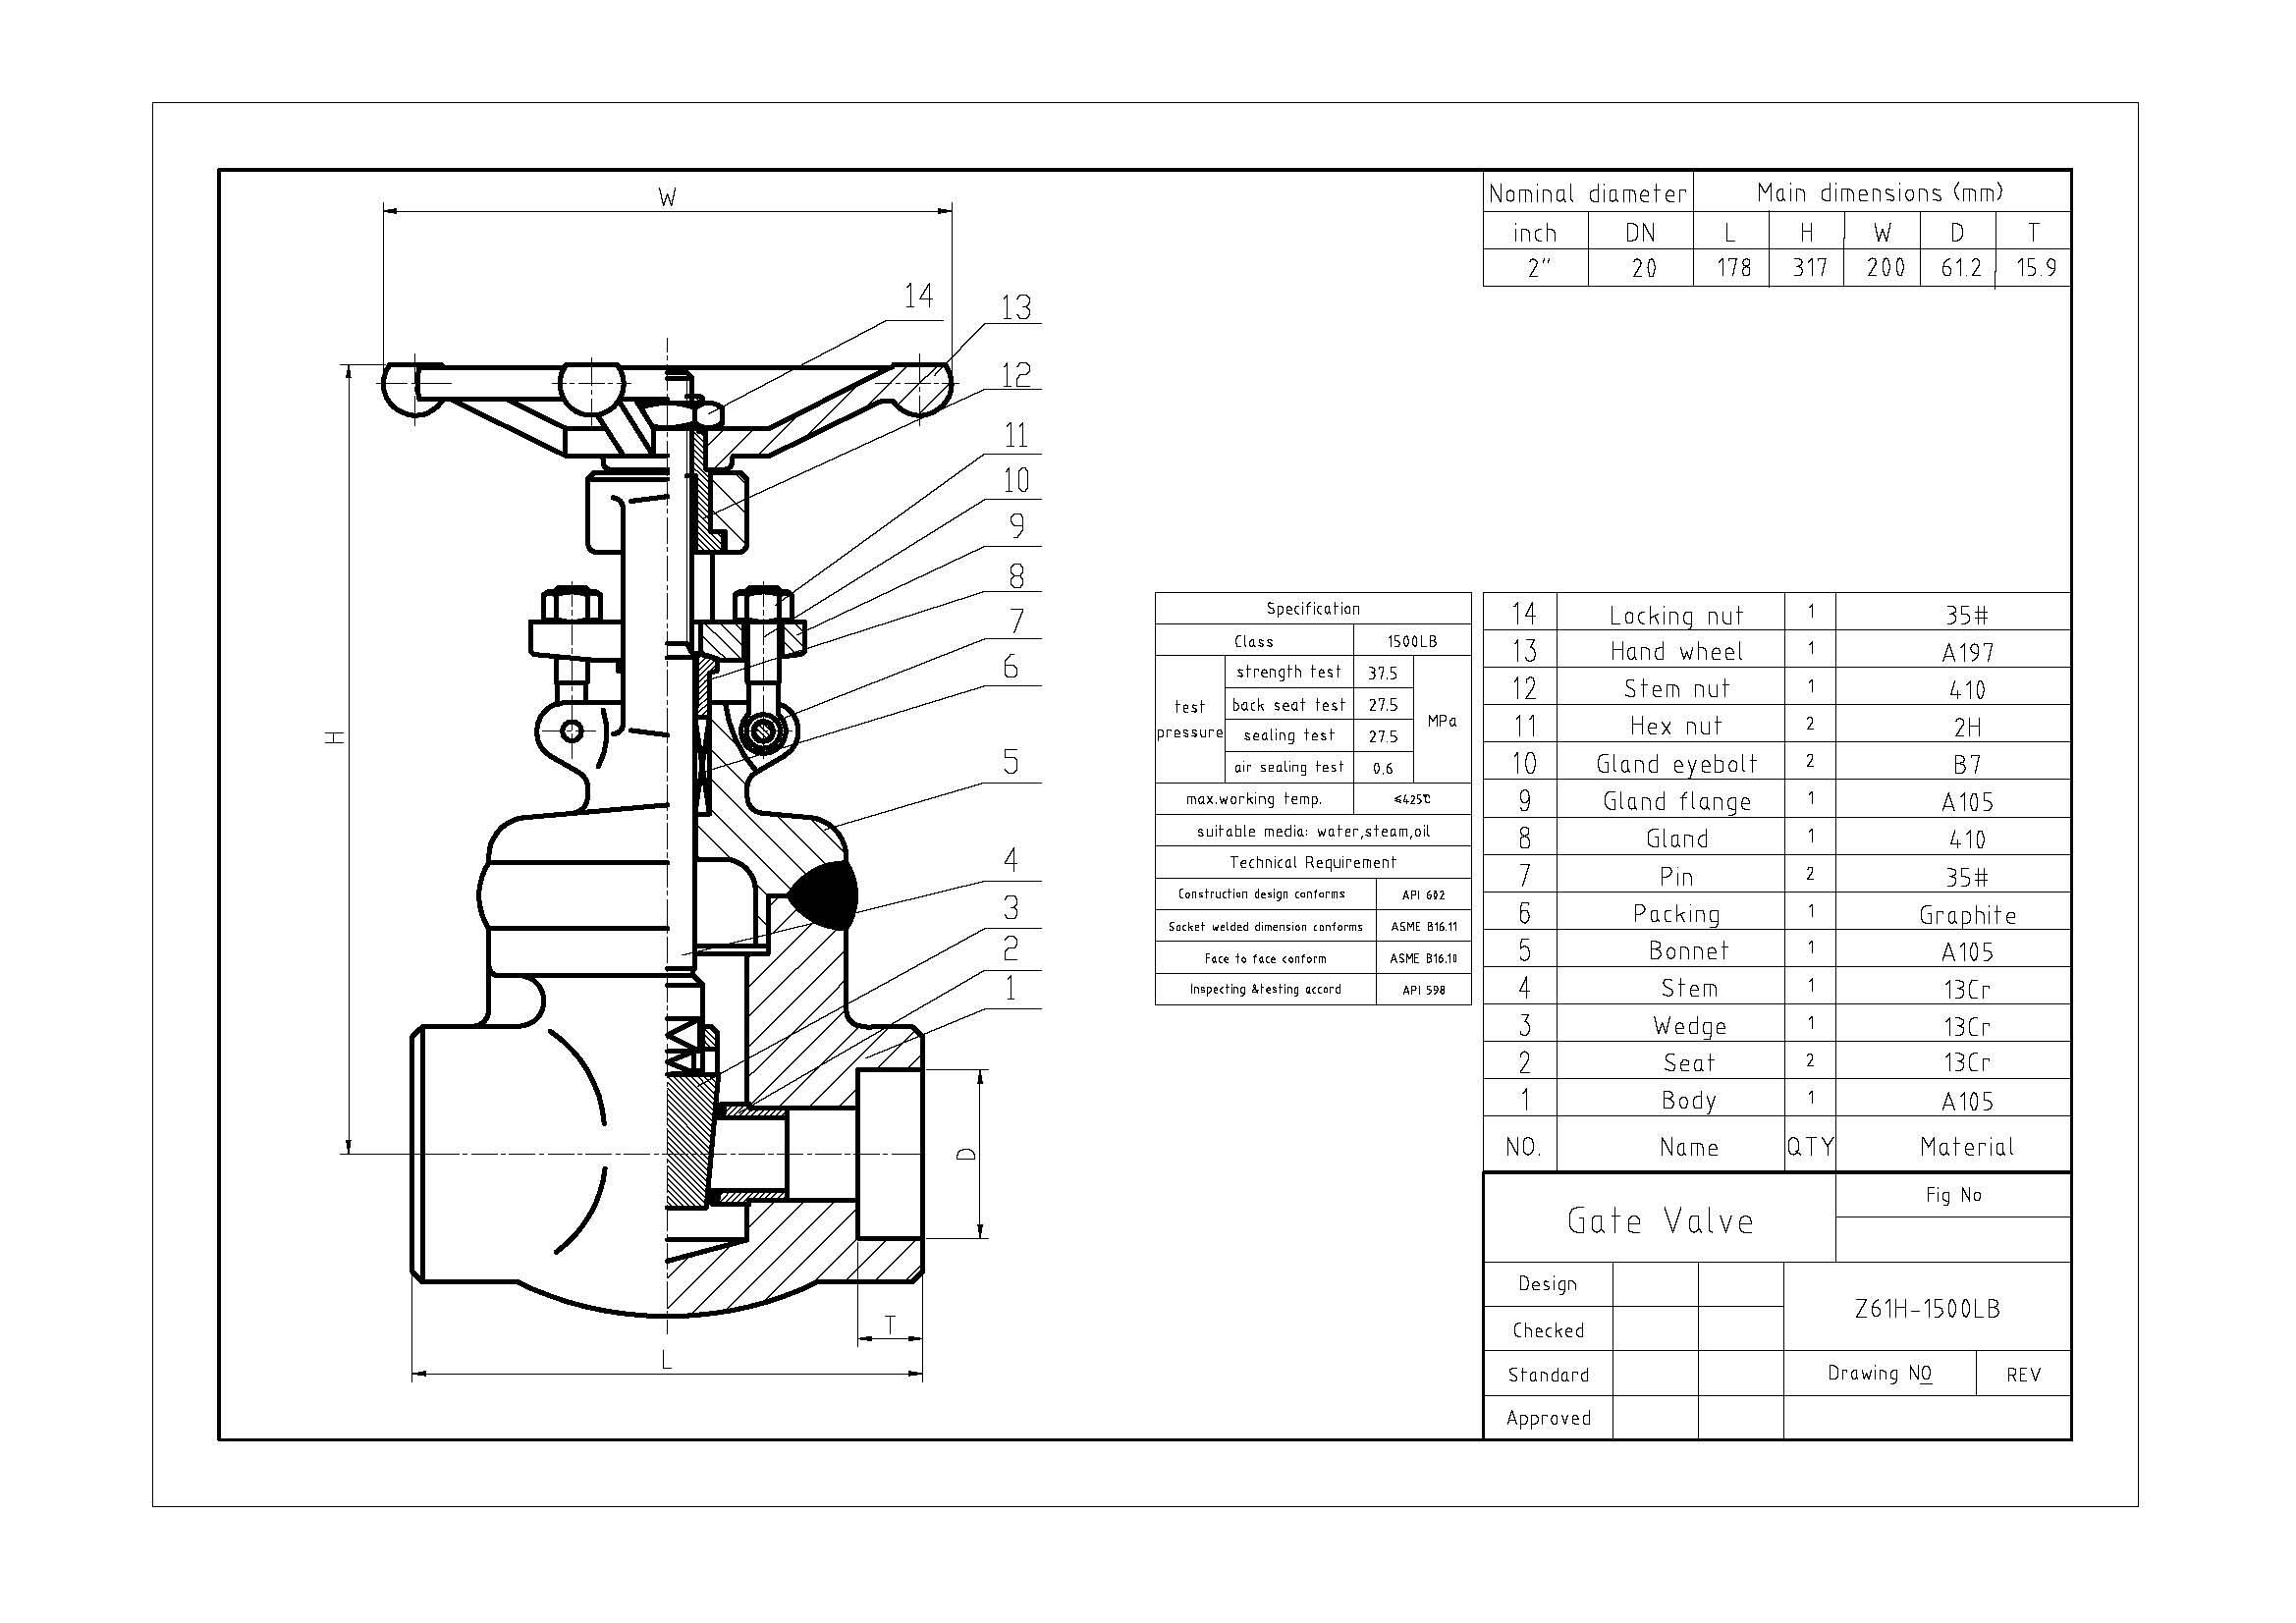 Lb Forged Steel Weld Bonnet Gate Valve A105n Body Dn50 Socket Weld End Industrial Valves